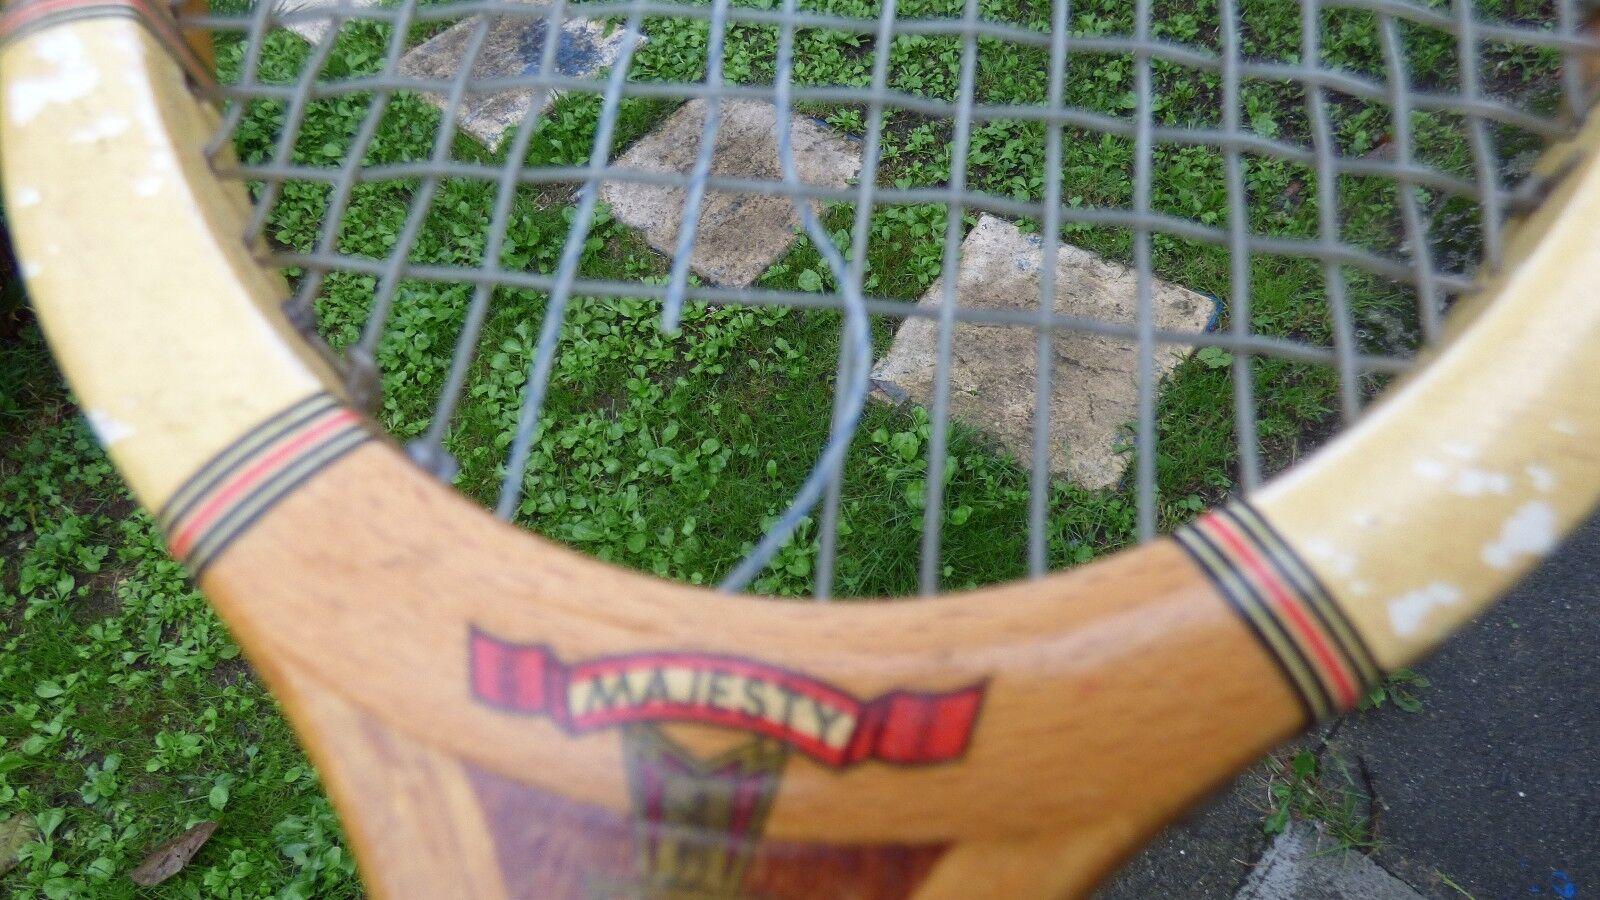 Tennisschläger vintage Artus Artus Artus Majesty aus Holz c9e5c9